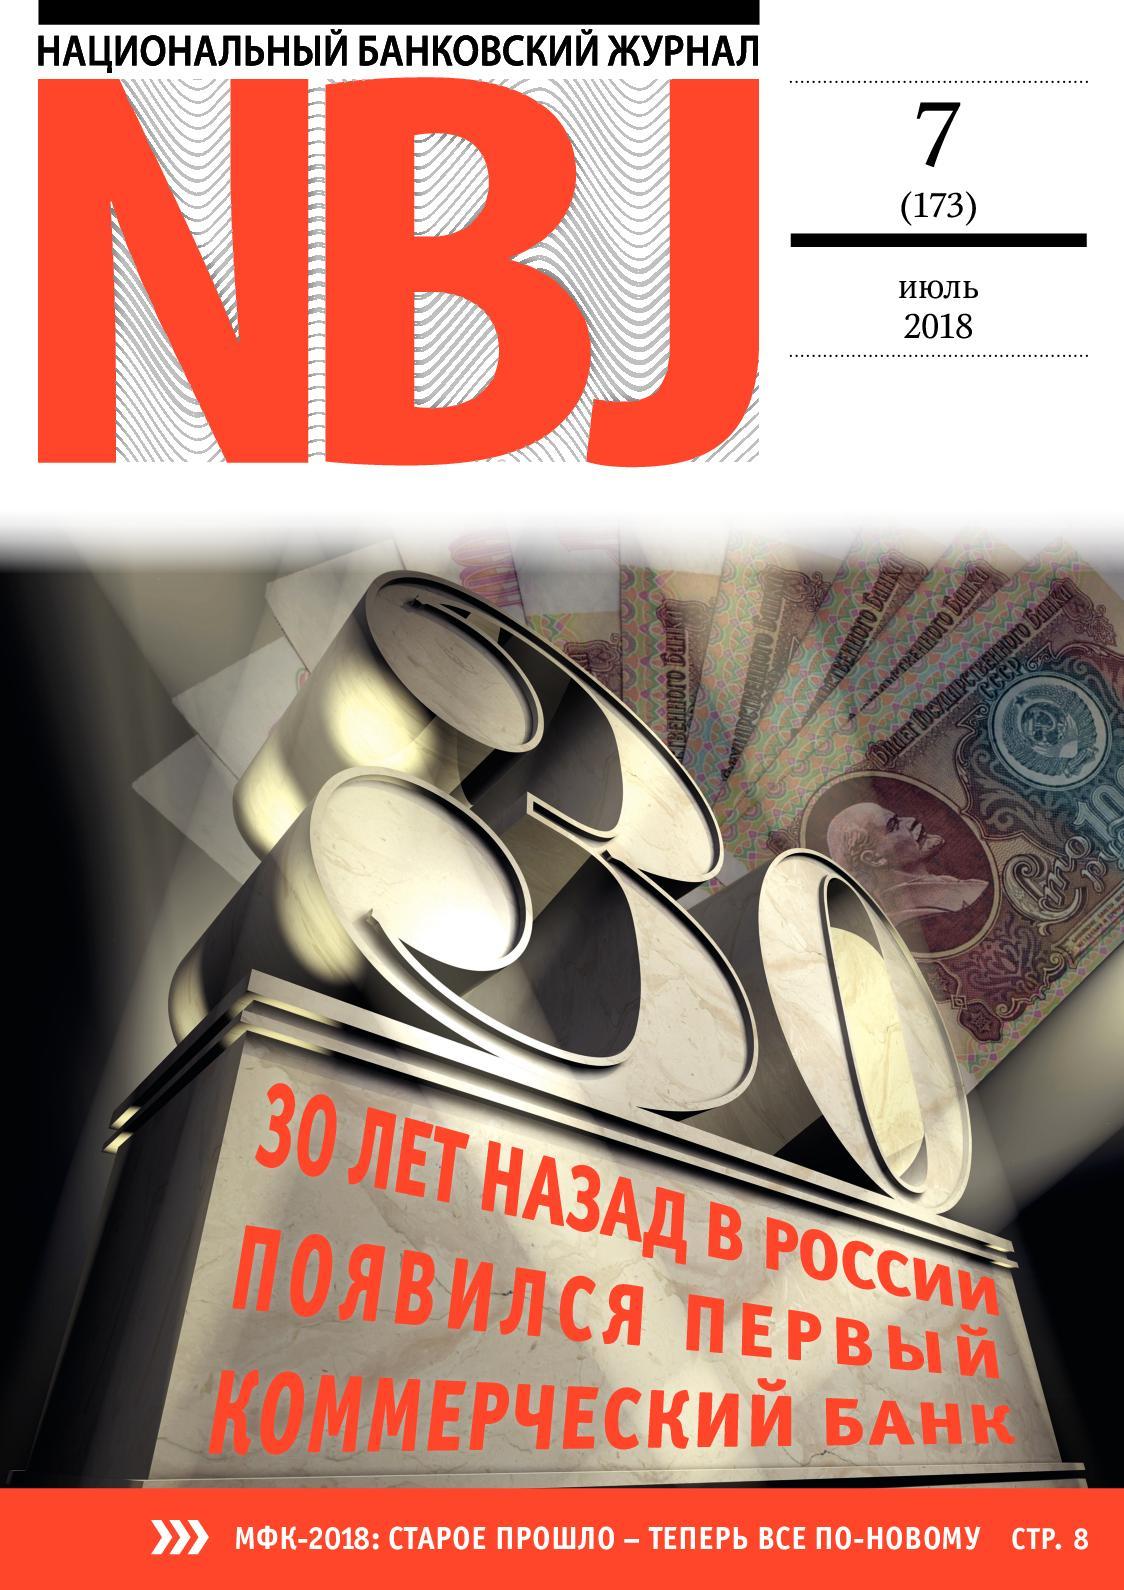 sravni.ru кредит наличными без справок и поручителей на карту онлайн в мурманске потребительский кредит 30000 от 19 лет